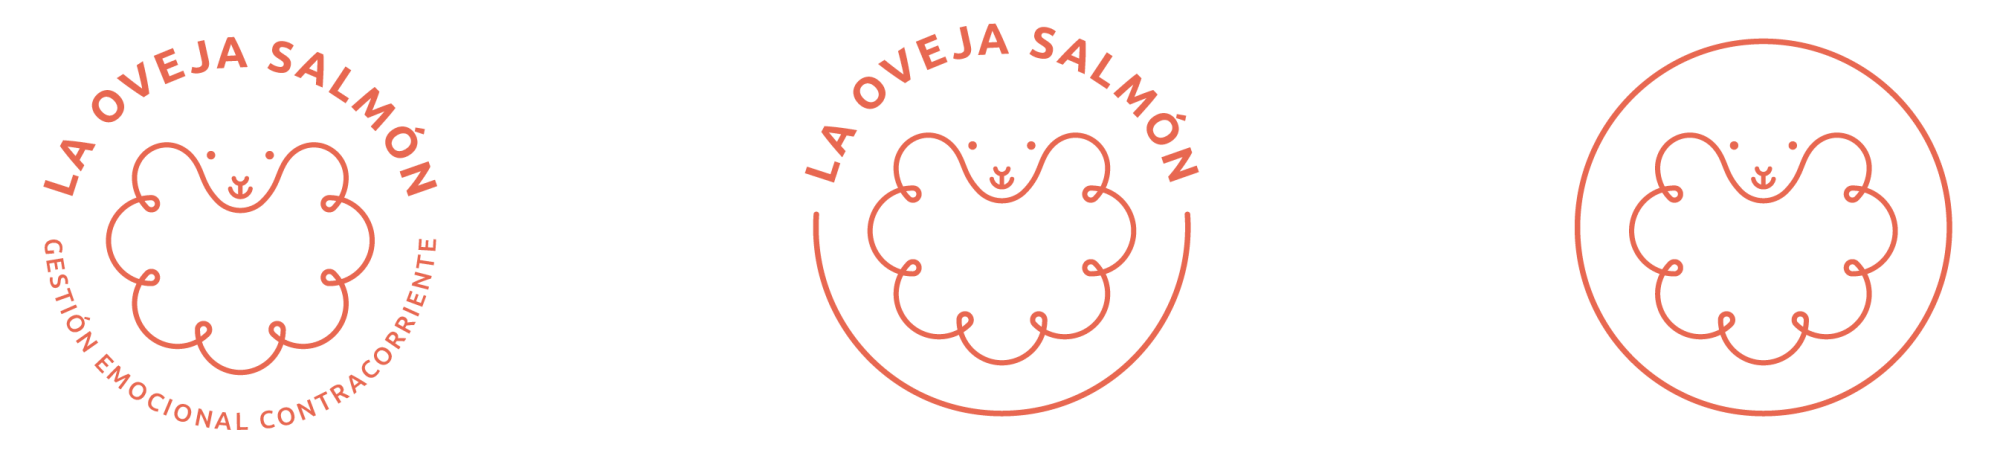 hoyeseldia-laovejasalmon-diseno-versiones-logo